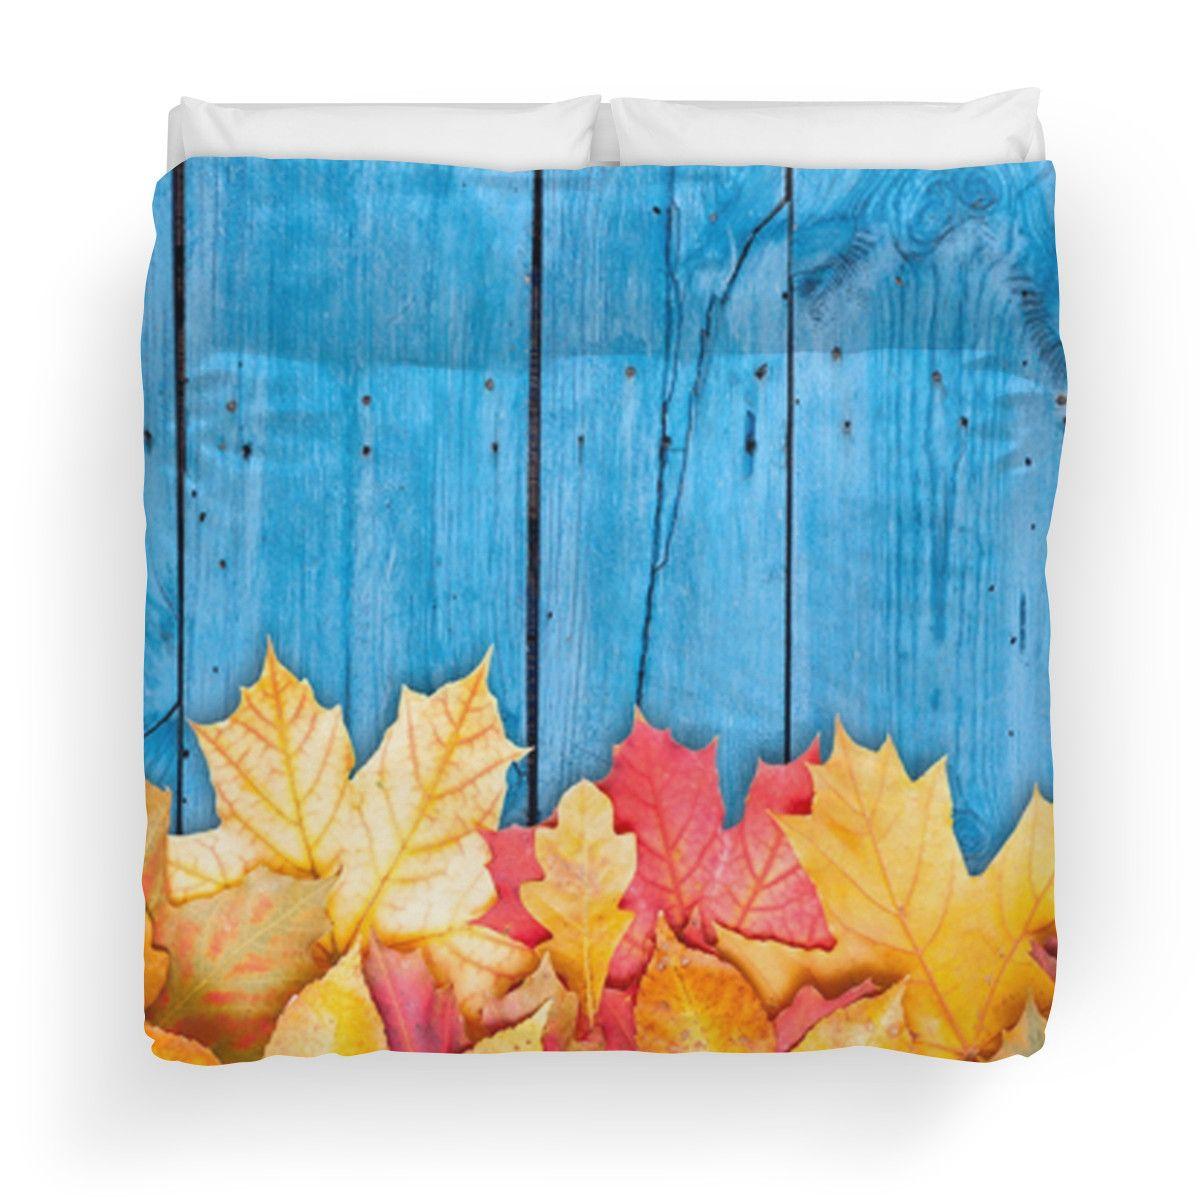 Halloween,fall,blue,wood wall,fall leafs,autumn,digital photo,modern,trendy